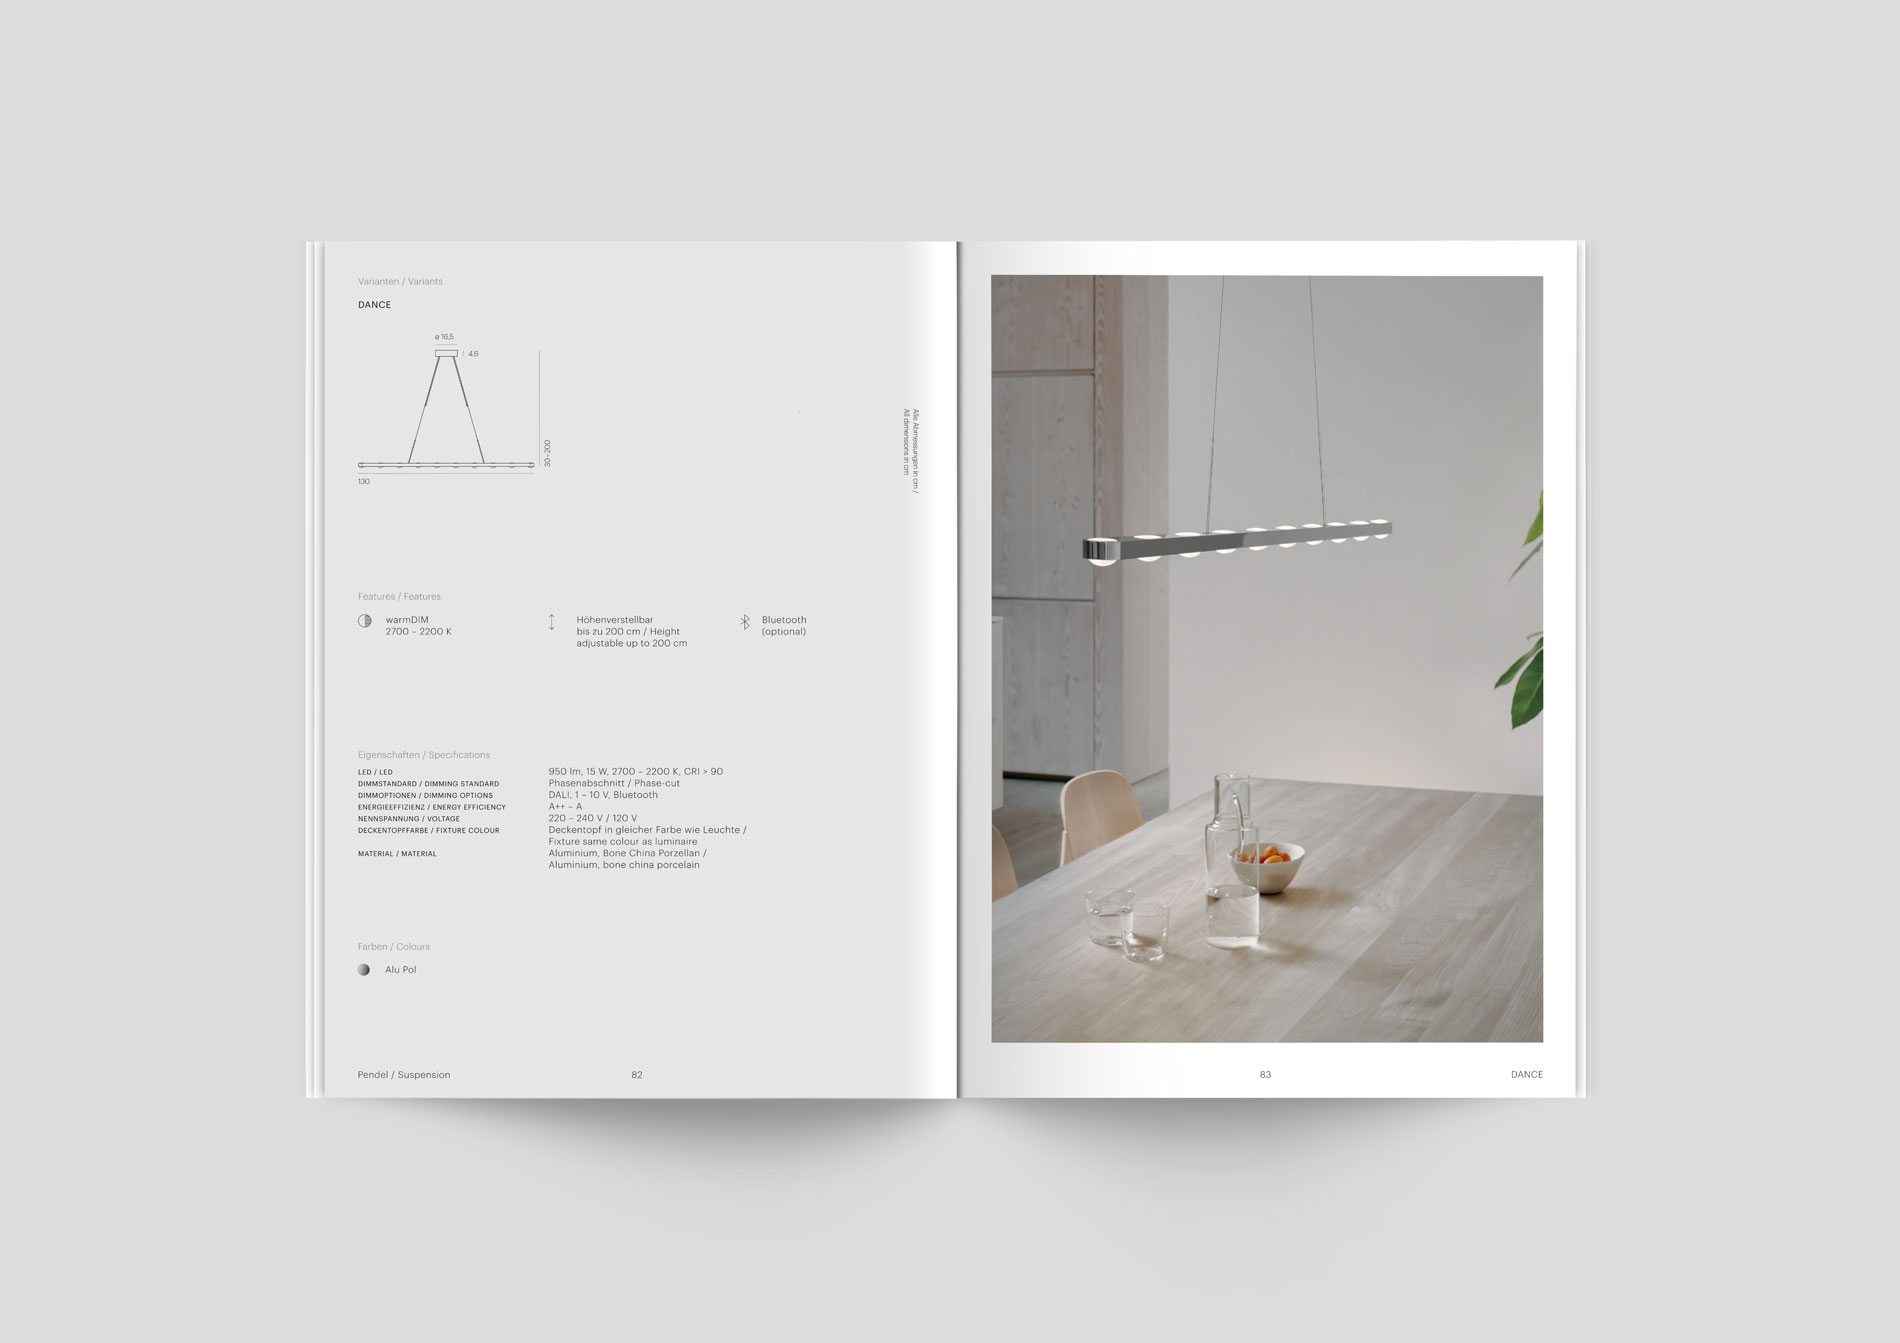 nicoletta-dalfino-tobias-grau-catalogue-2019-11